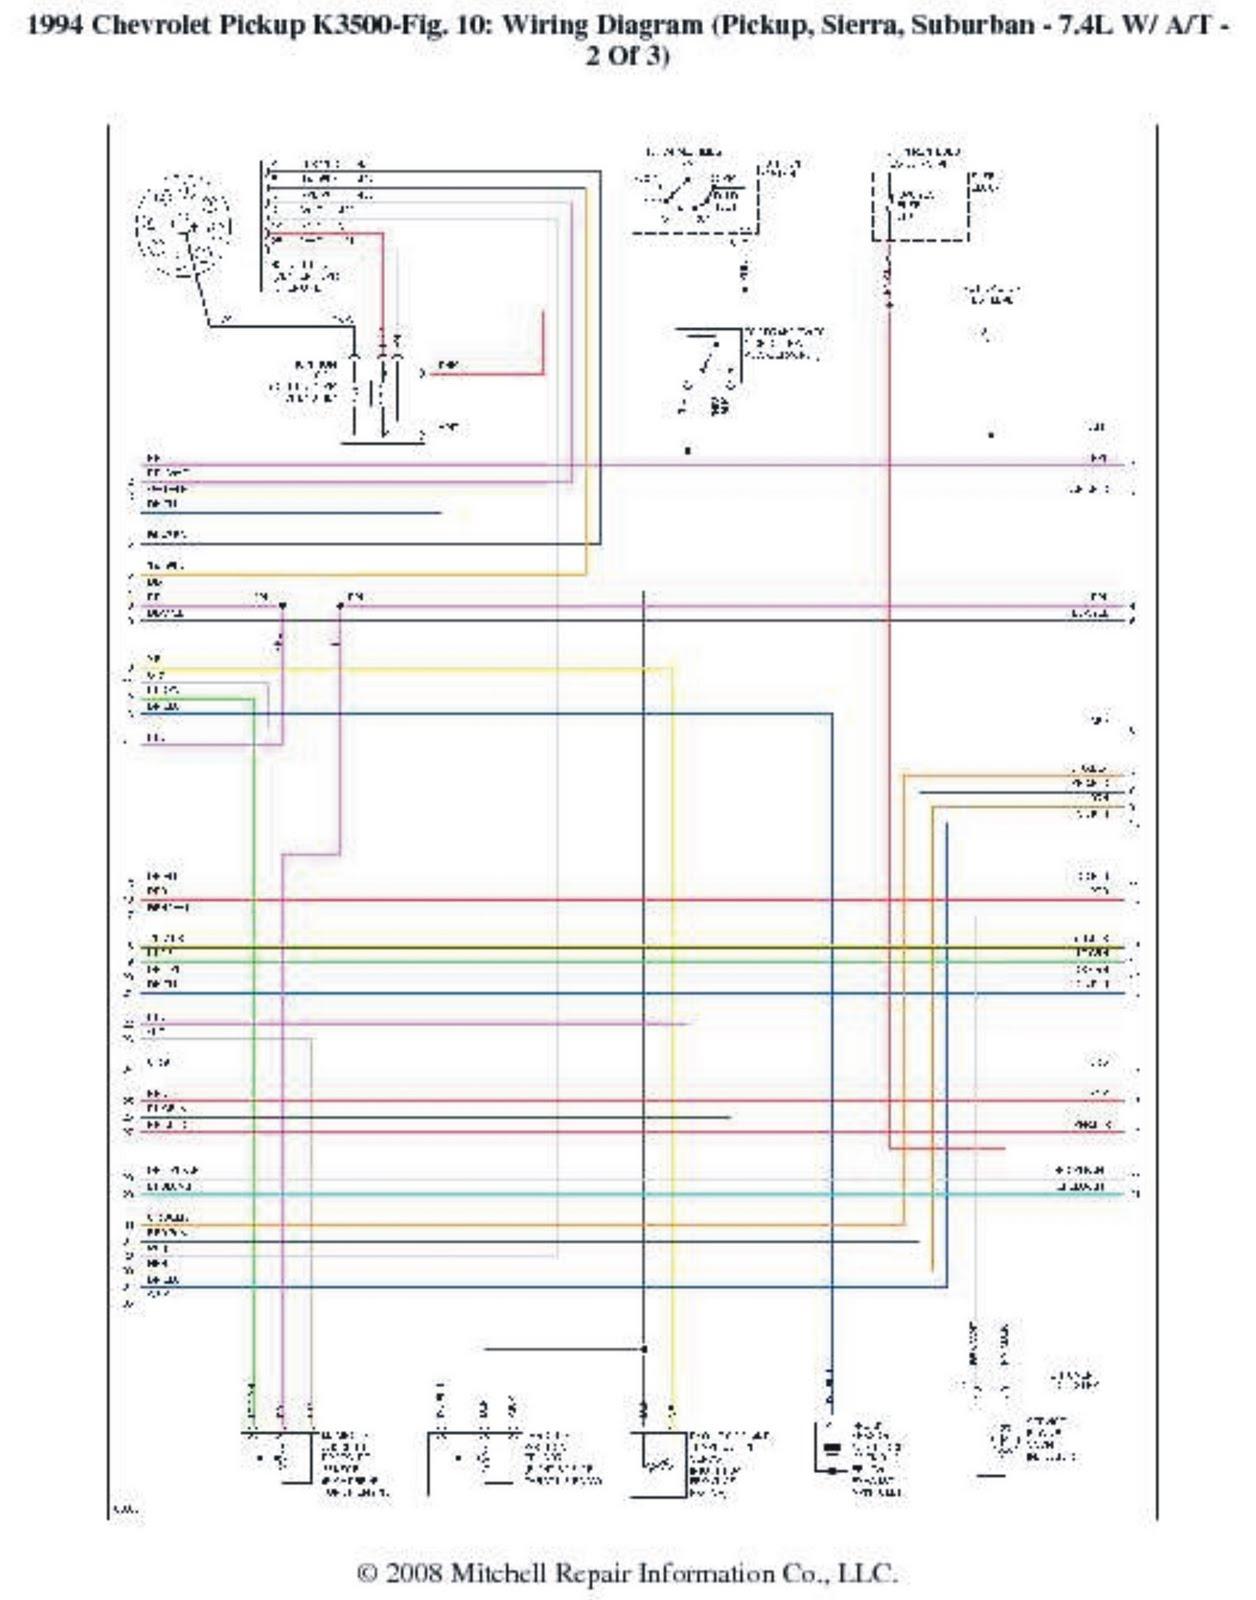 93 Chevy S10 Blazer Radio Wiring Diagram Pontiac Grand Prix Ignition Trusted Schematics S On